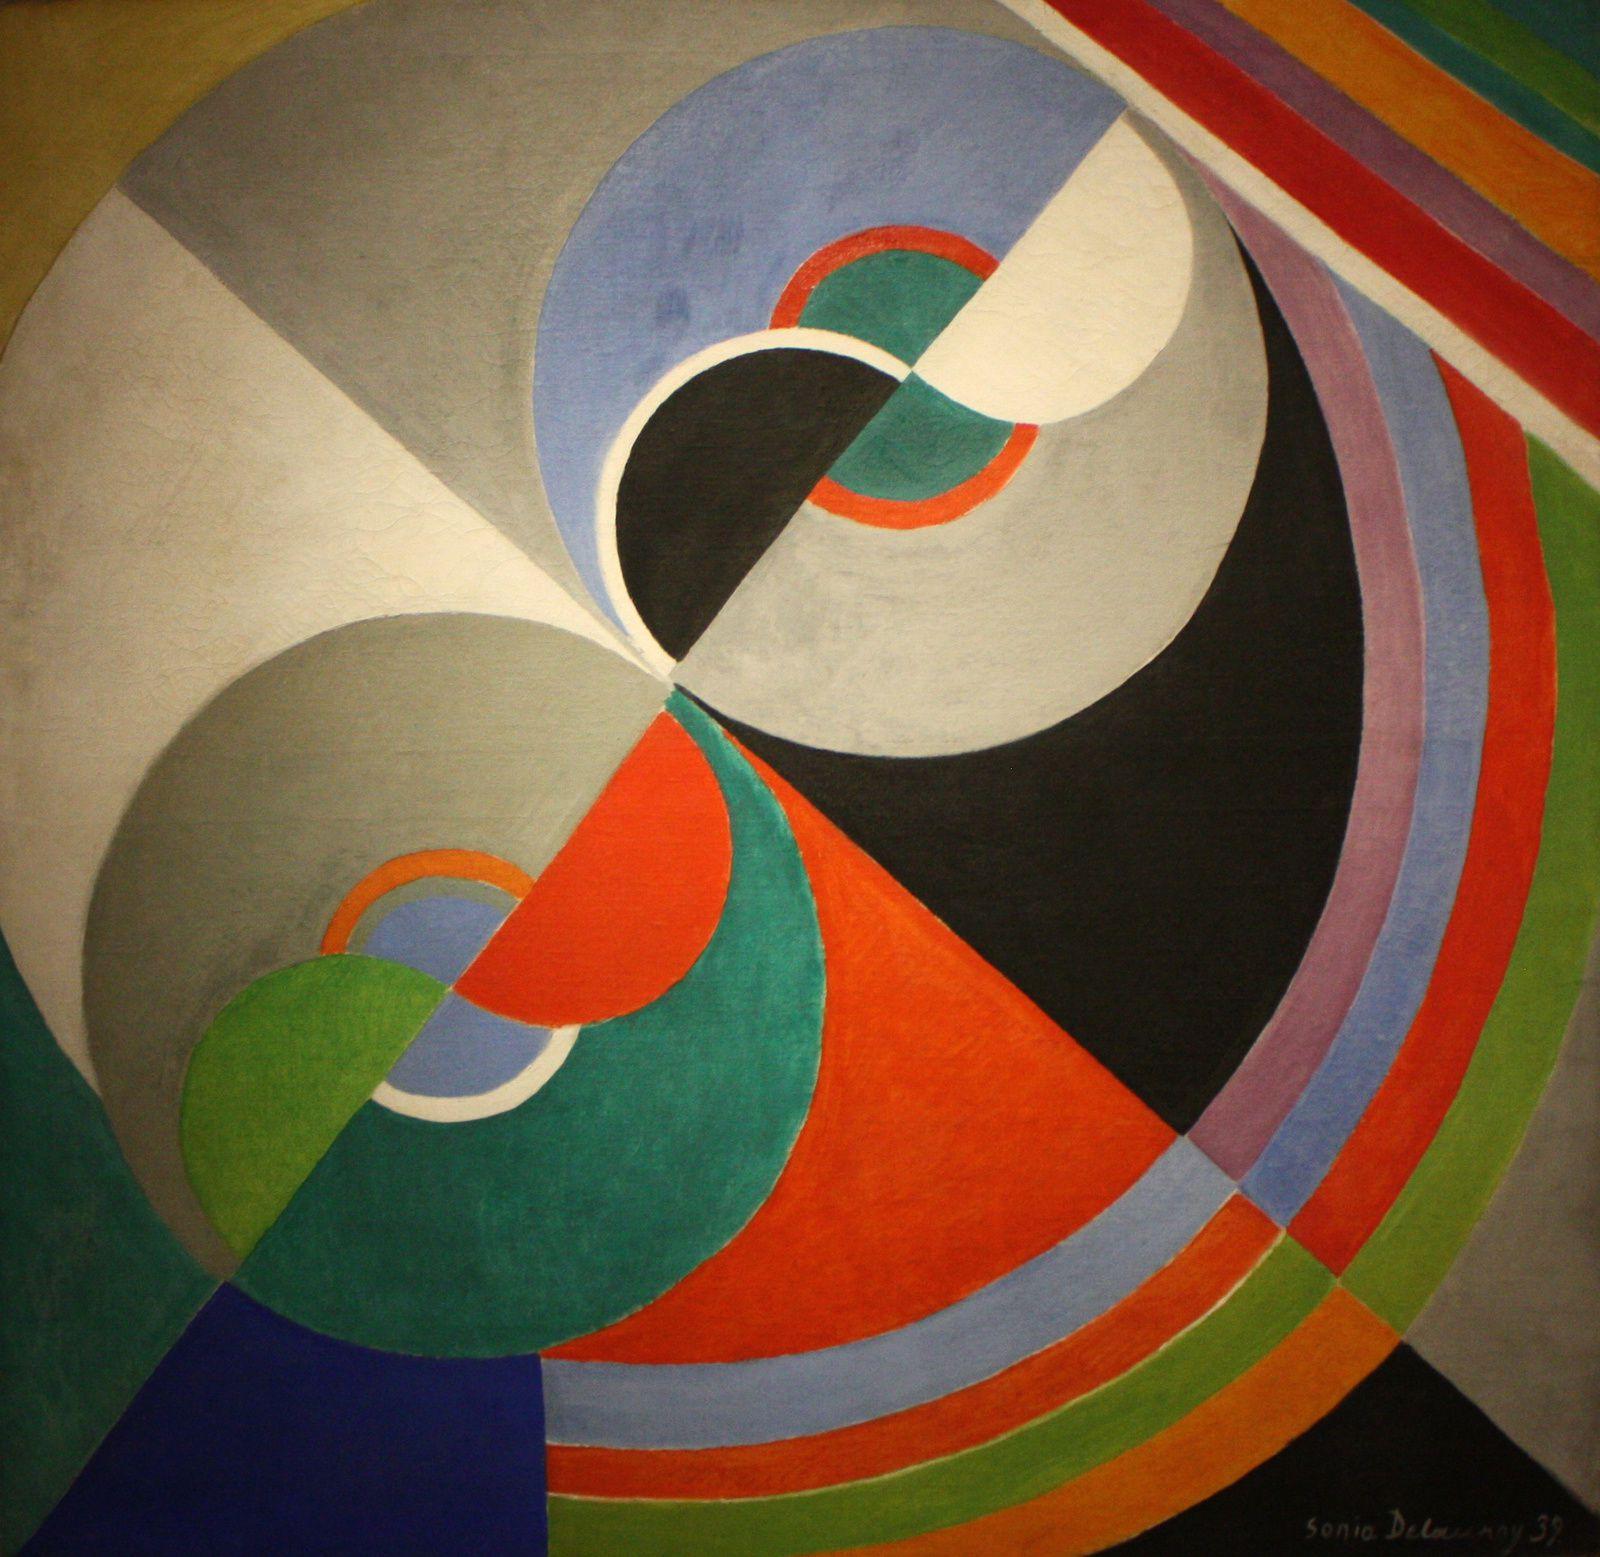 """Rythme couleur, N° 1076"", 1939 de Sonia Delaunay"